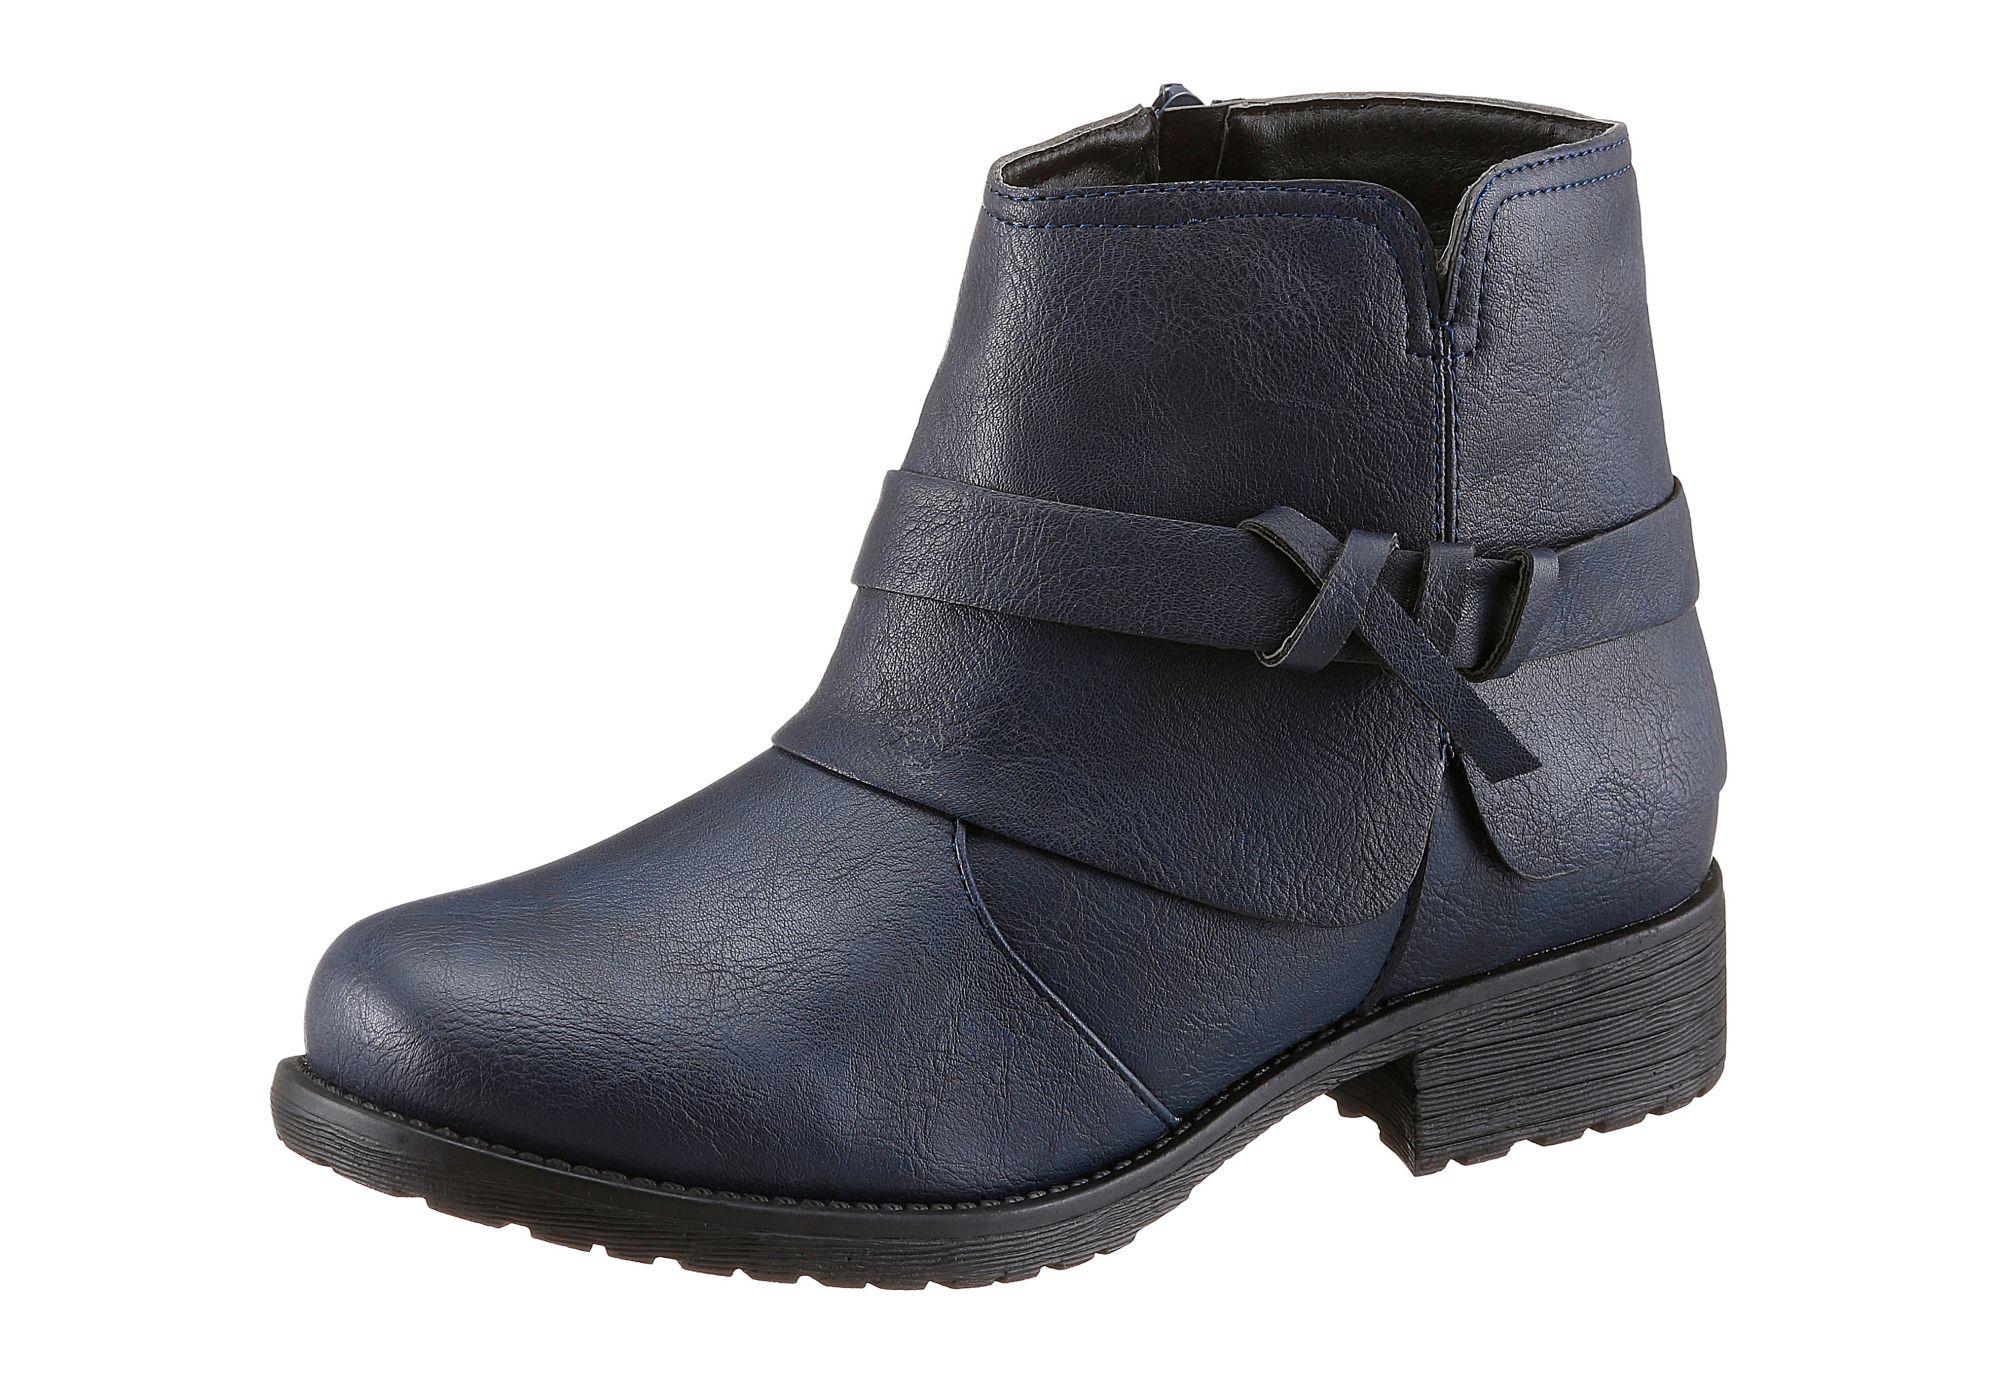 CITY WALK City Walk Boots